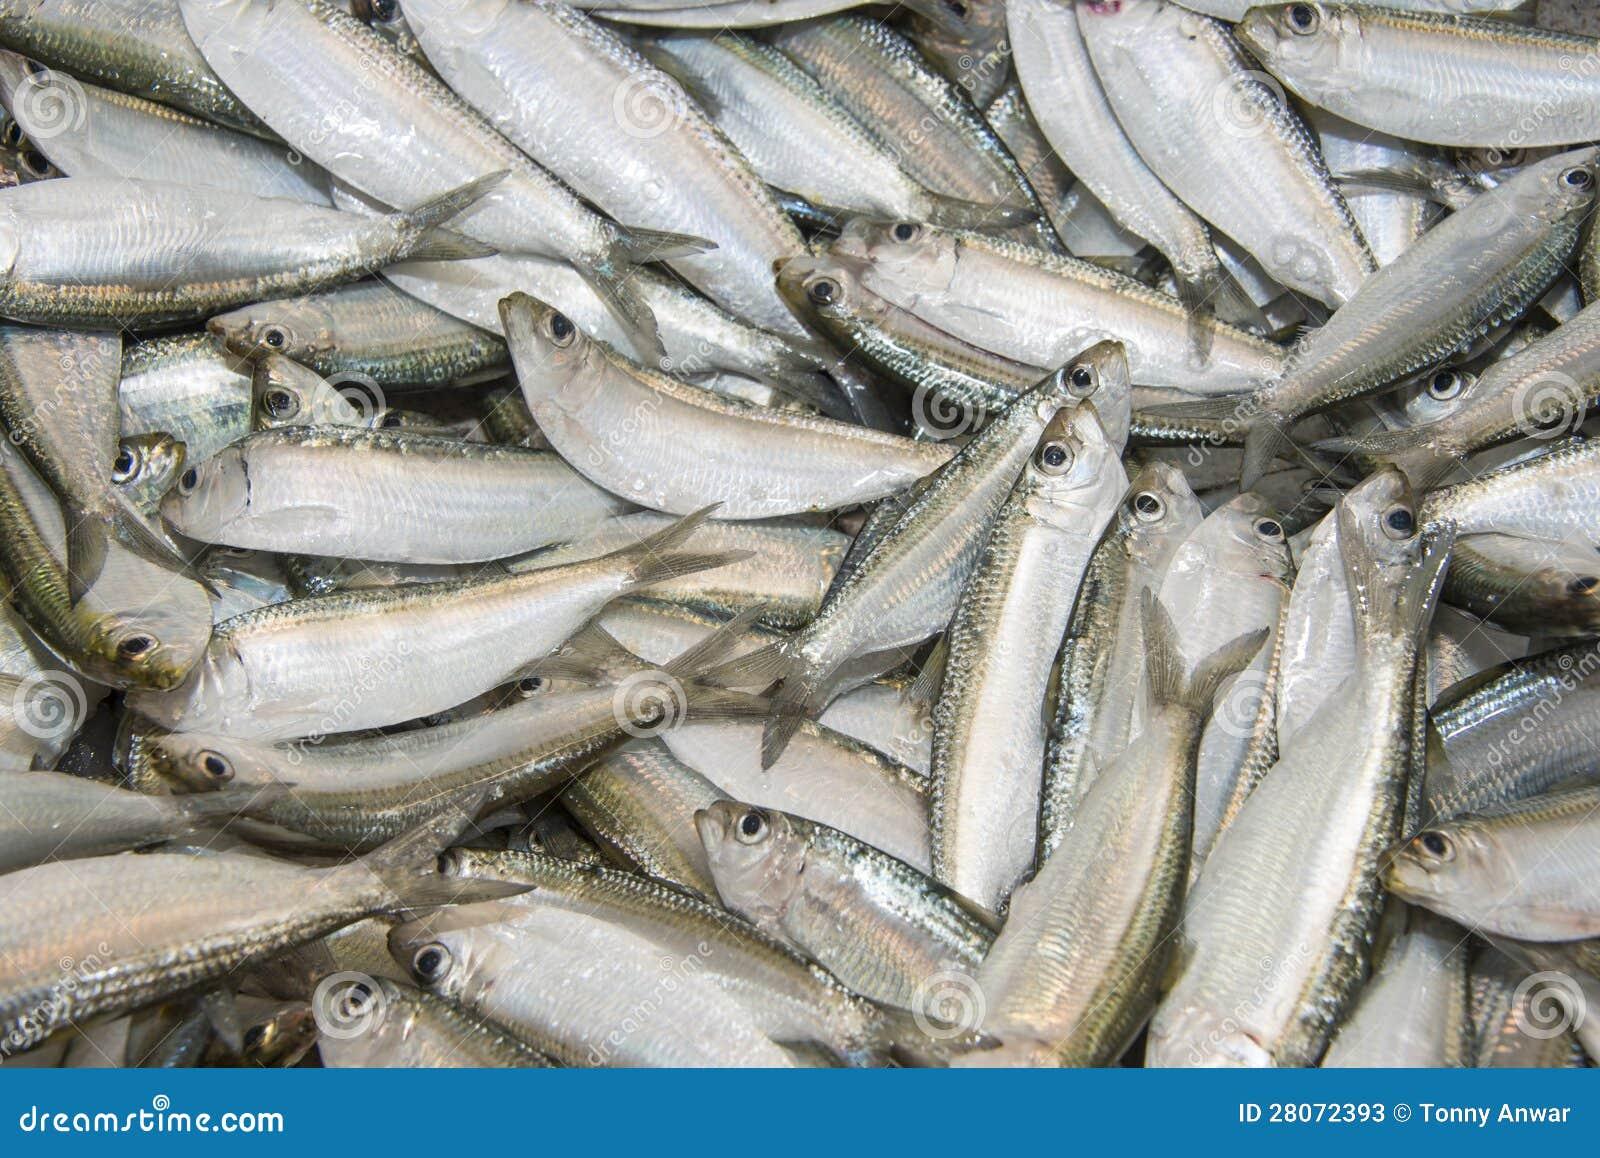 how to cook fresh sardines